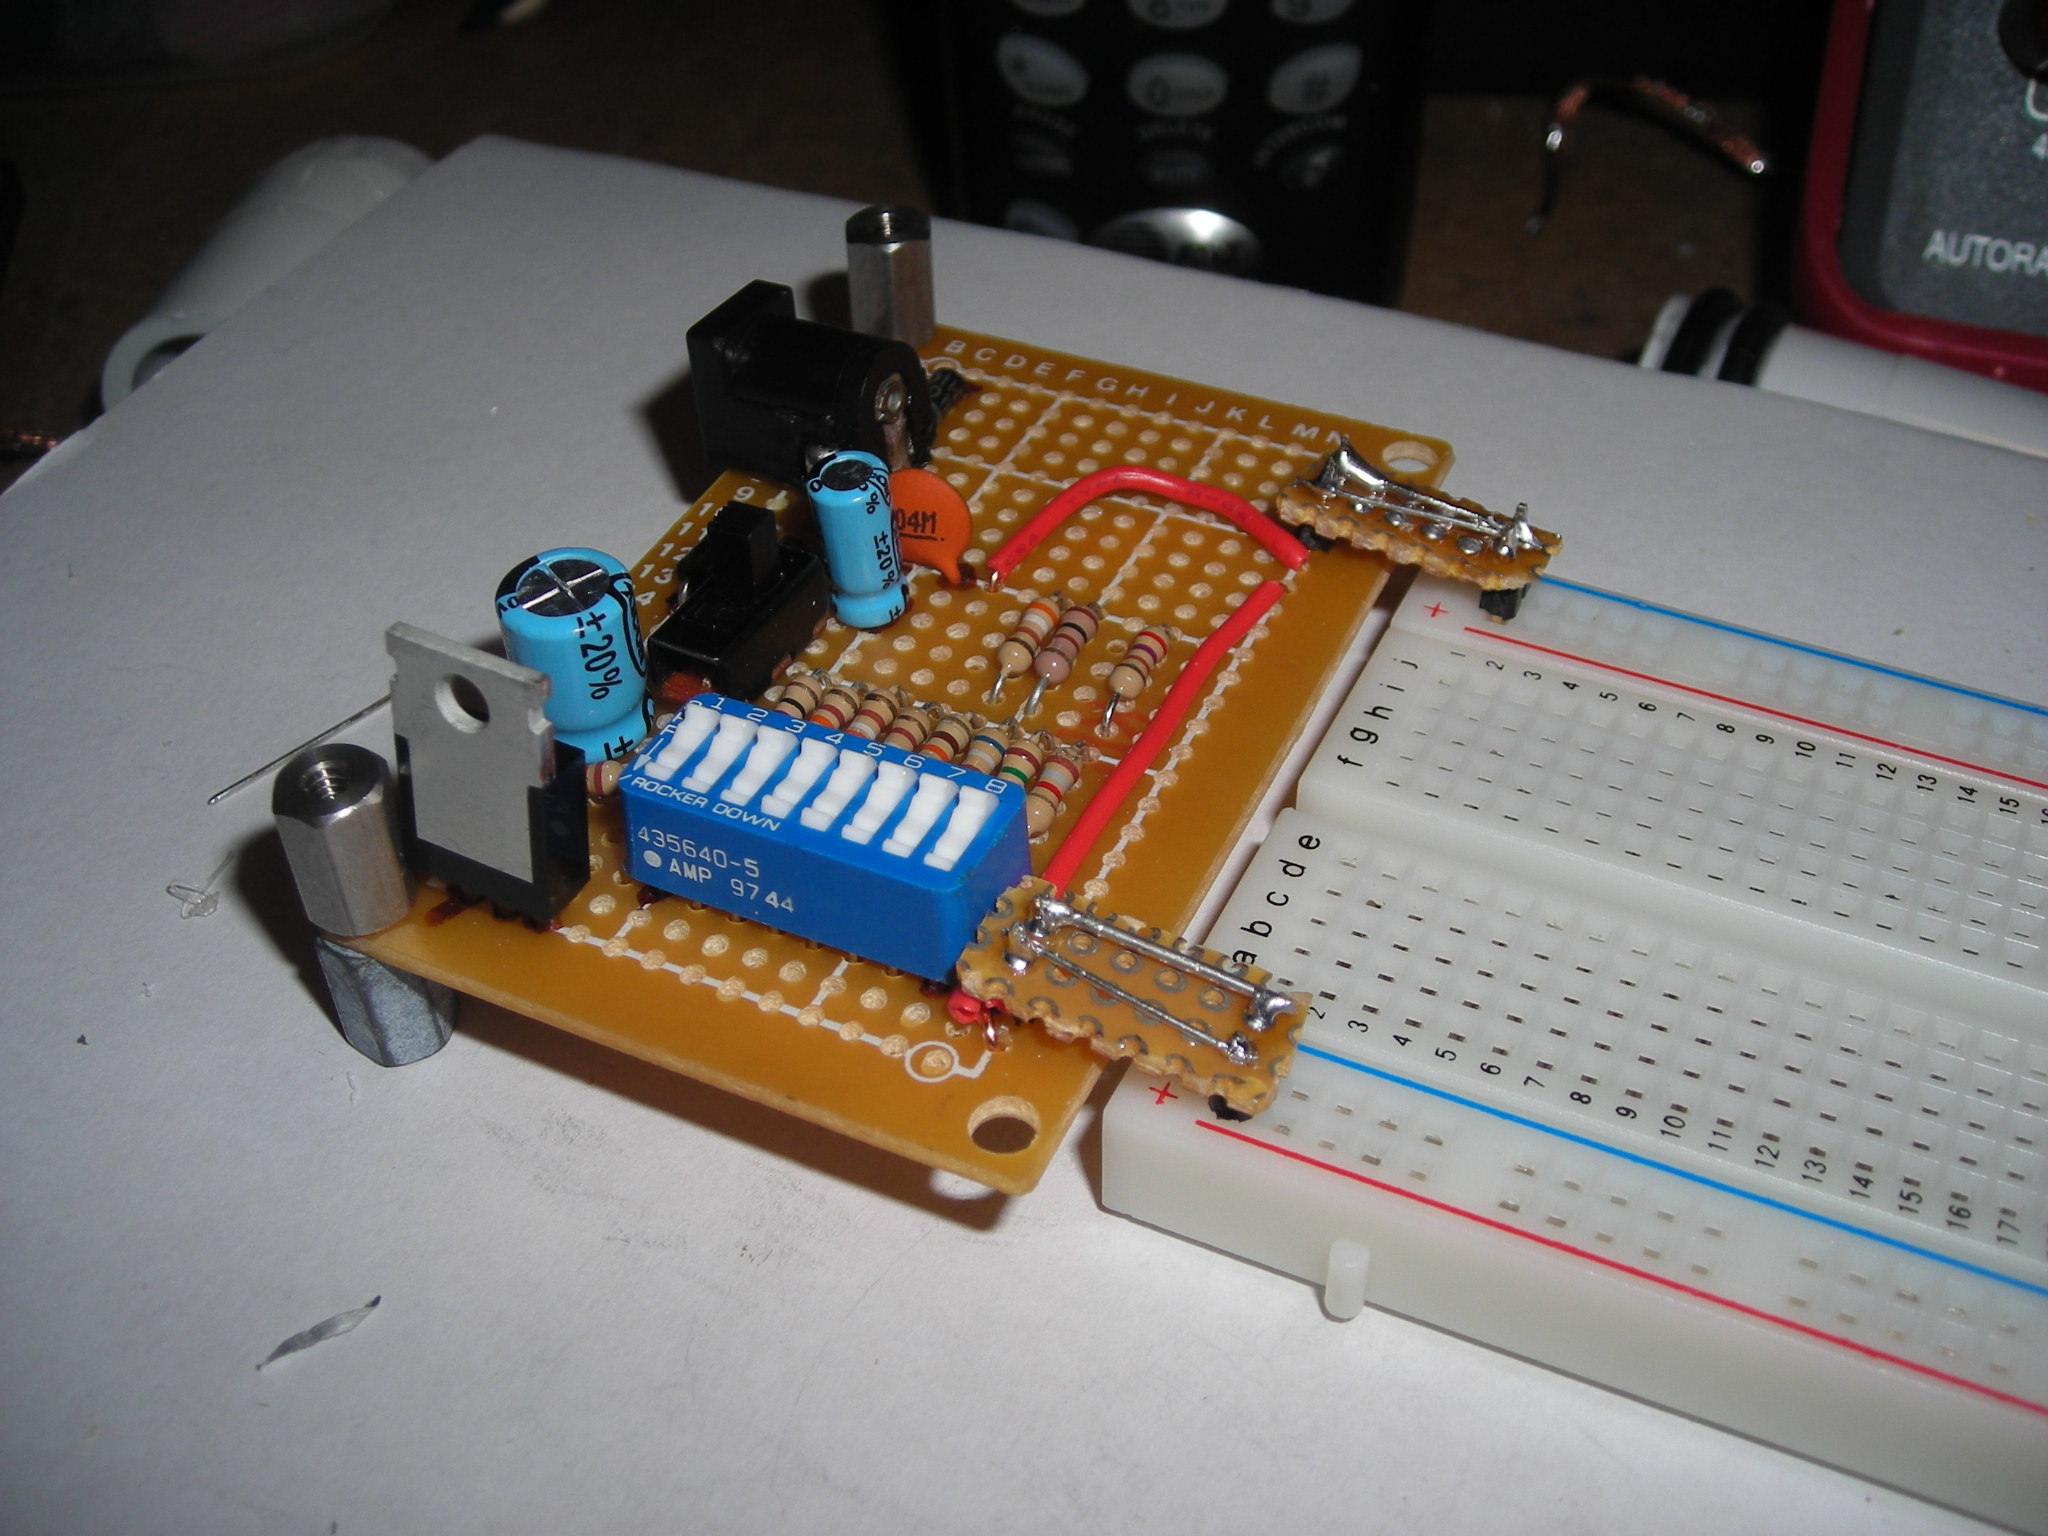 The Radioshack, Adjustable, Breadboard Power Supply.